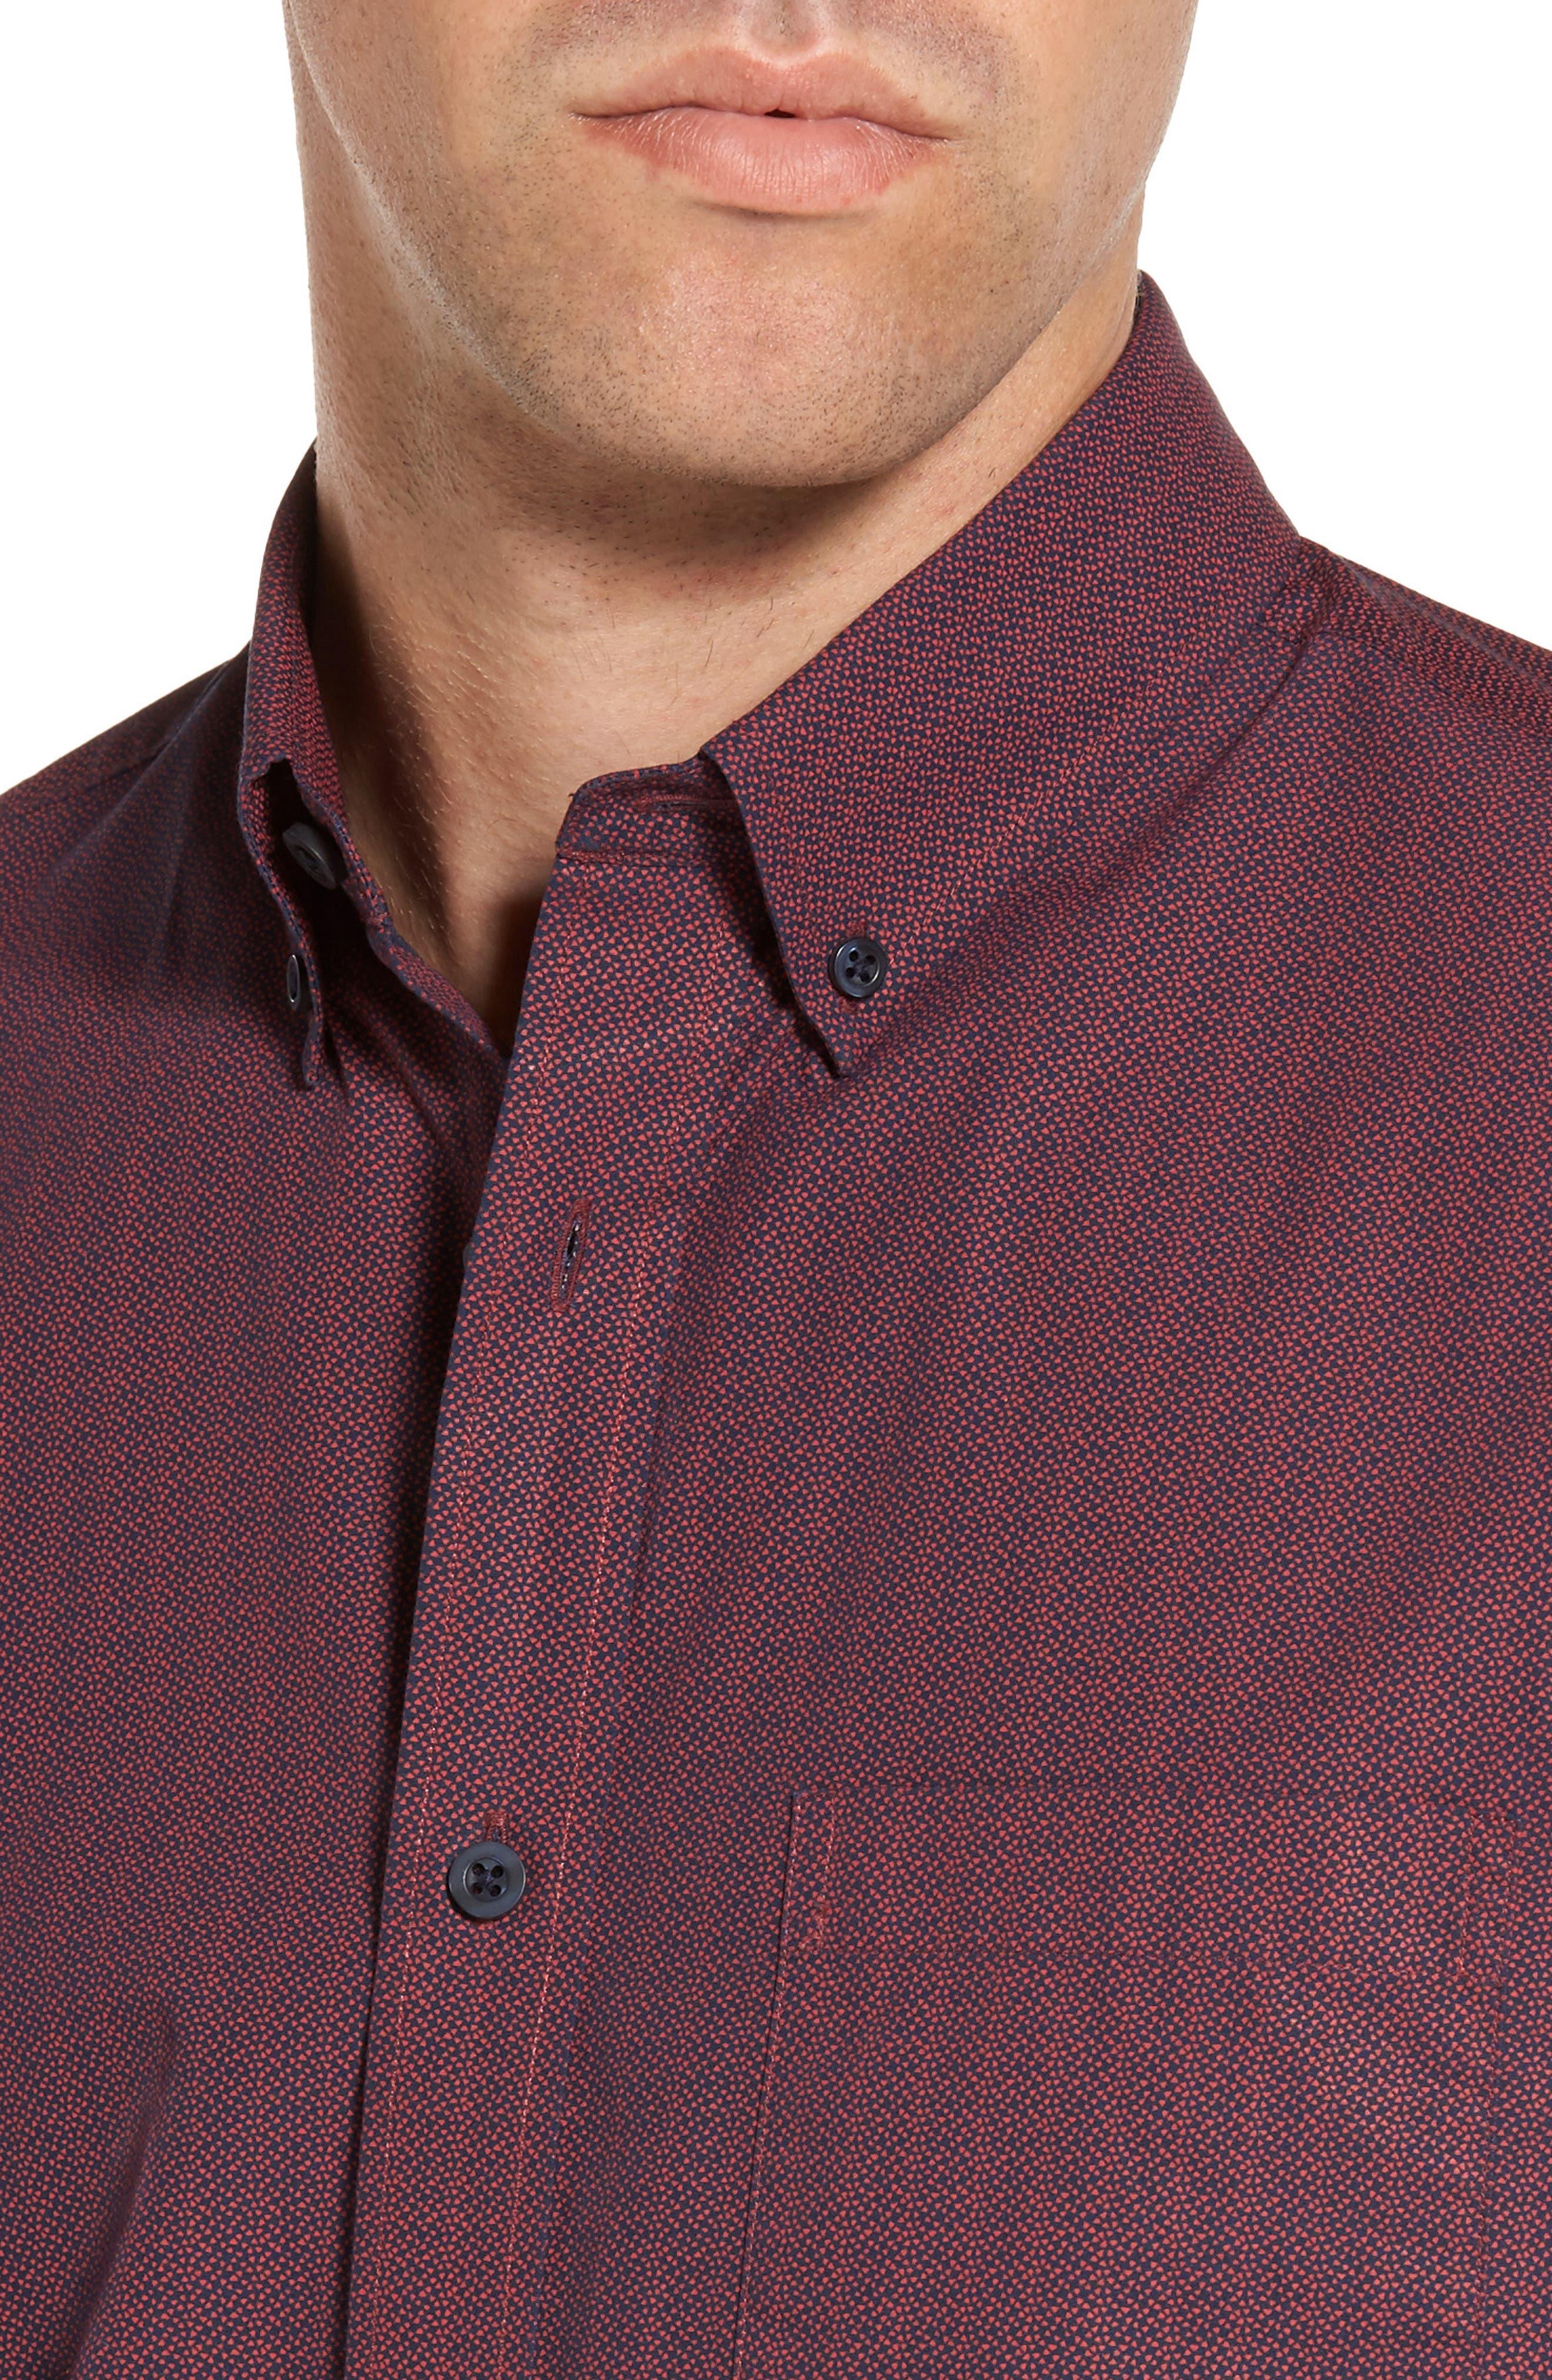 Slim Fit Print Sport Shirt,                             Alternate thumbnail 4, color,                             601